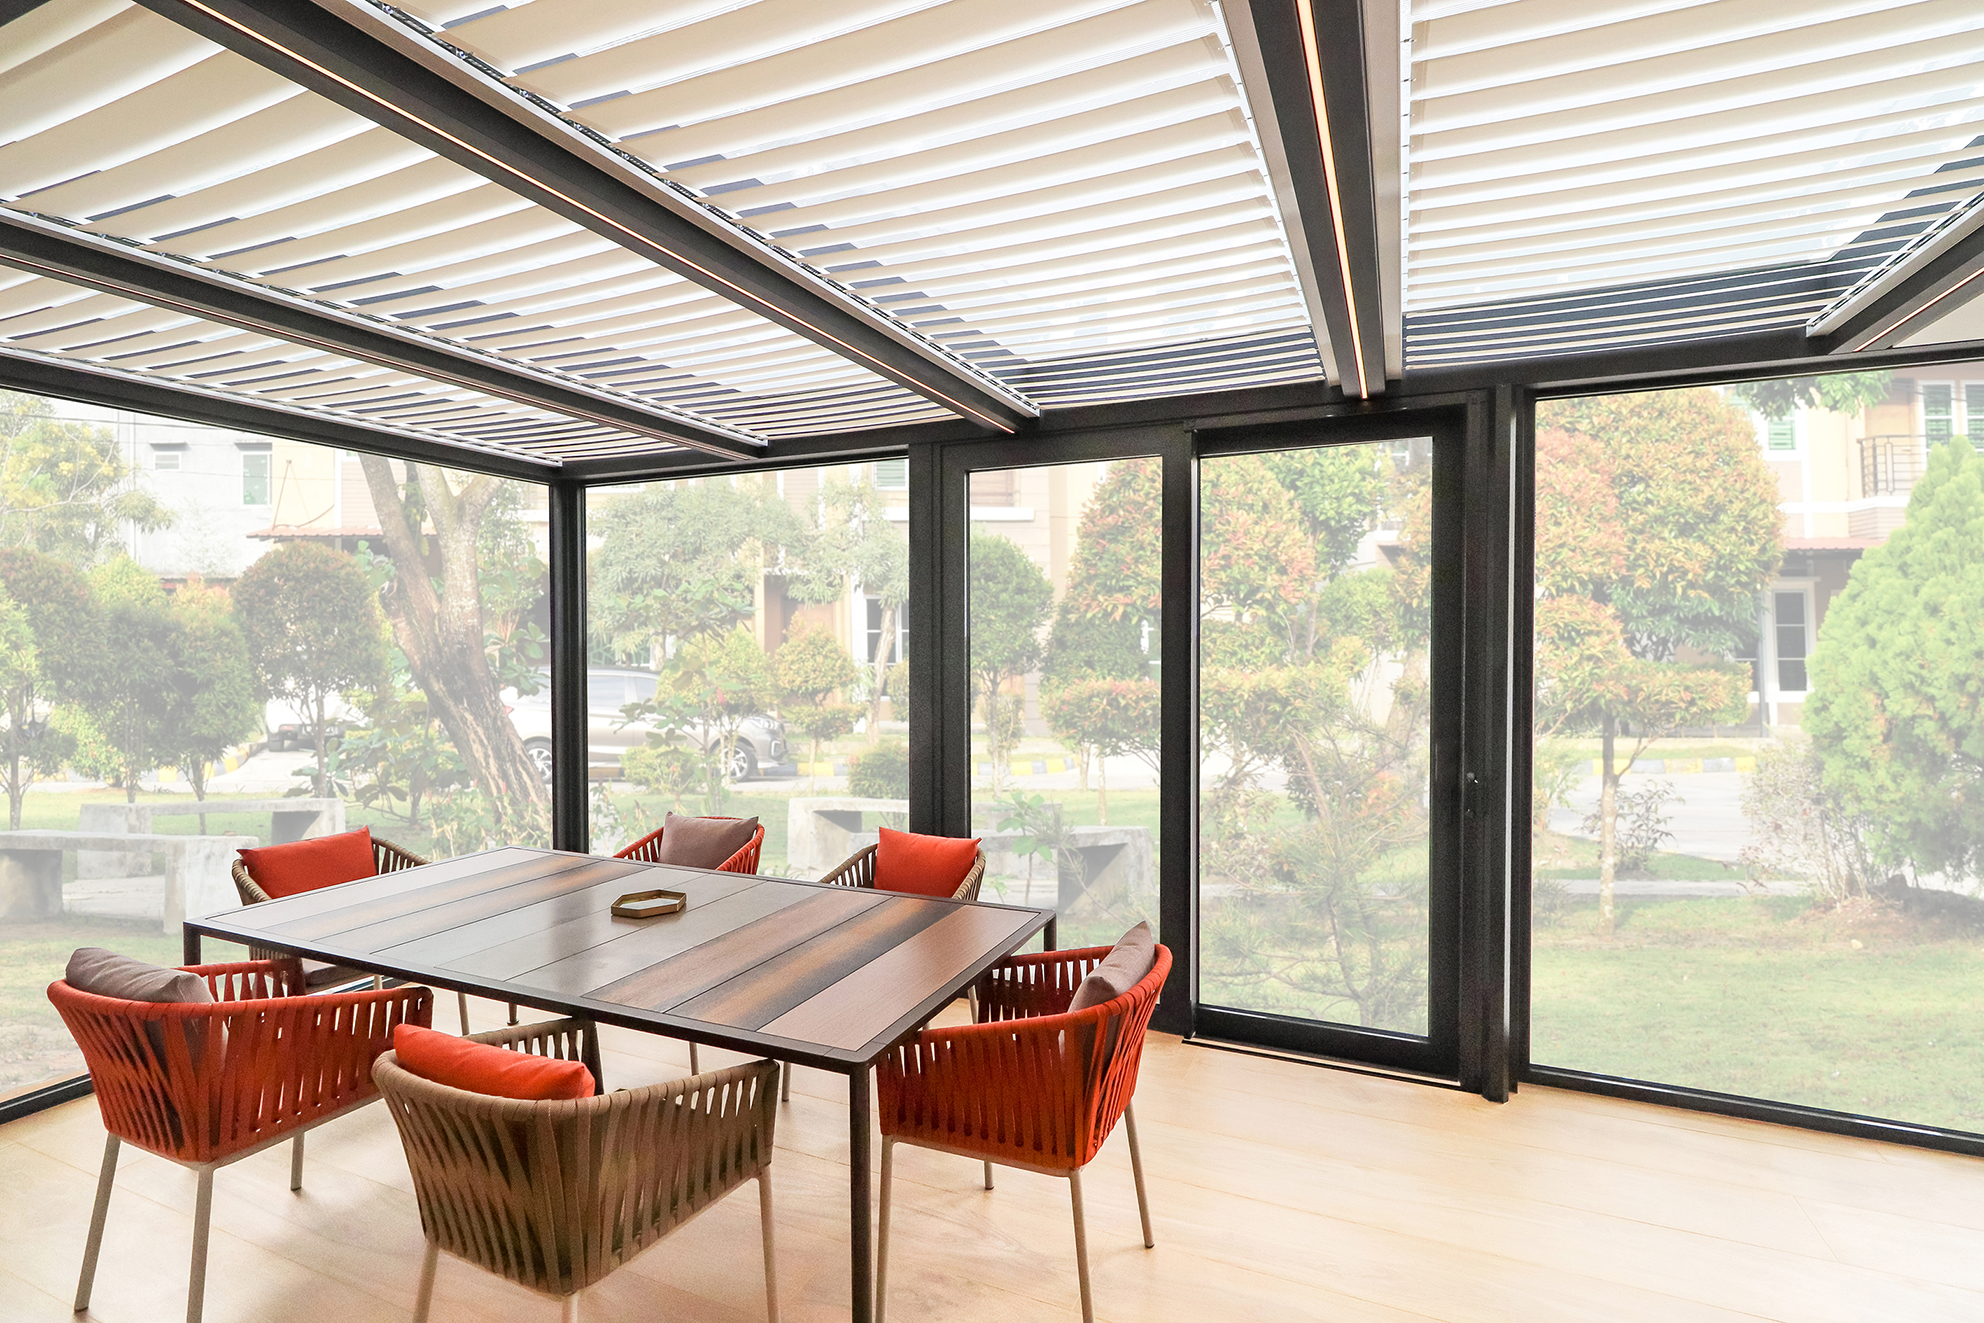 怡星鋁窗-Aliplast-歐洲高級鋁窗款式-European-Premium-Window-Window-and-door-solution